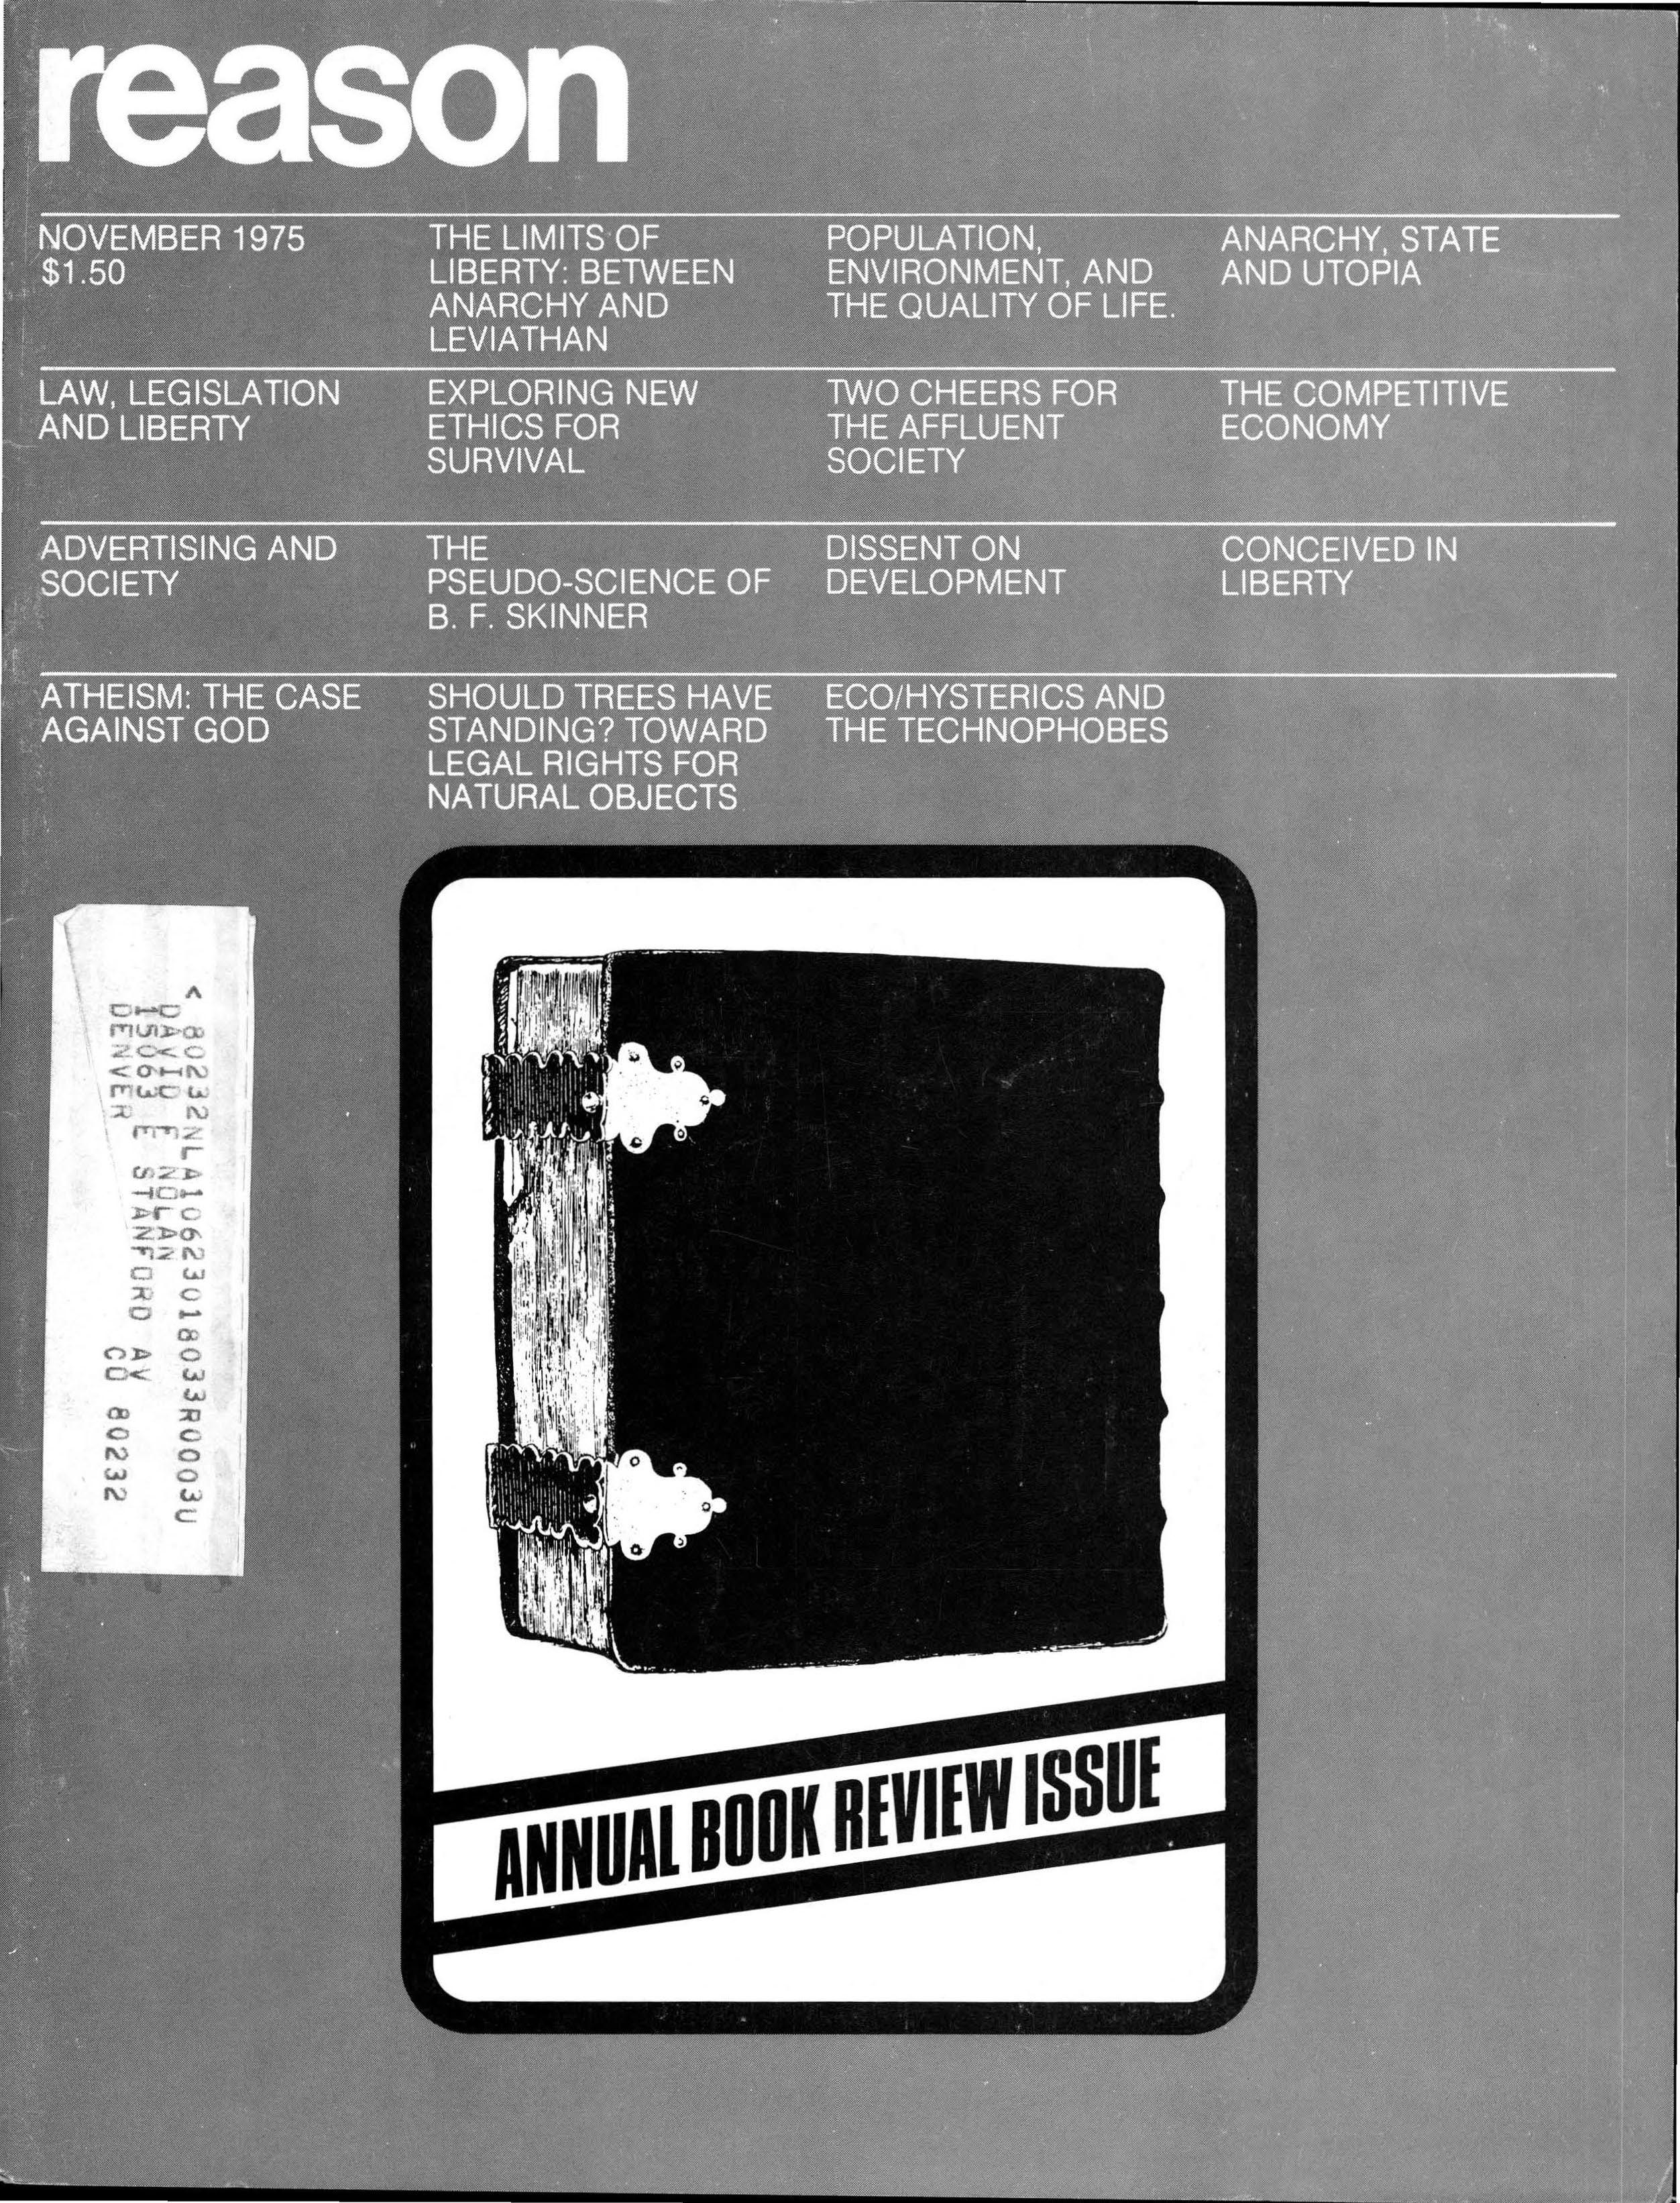 Reason Magazine, November 1975 cover image